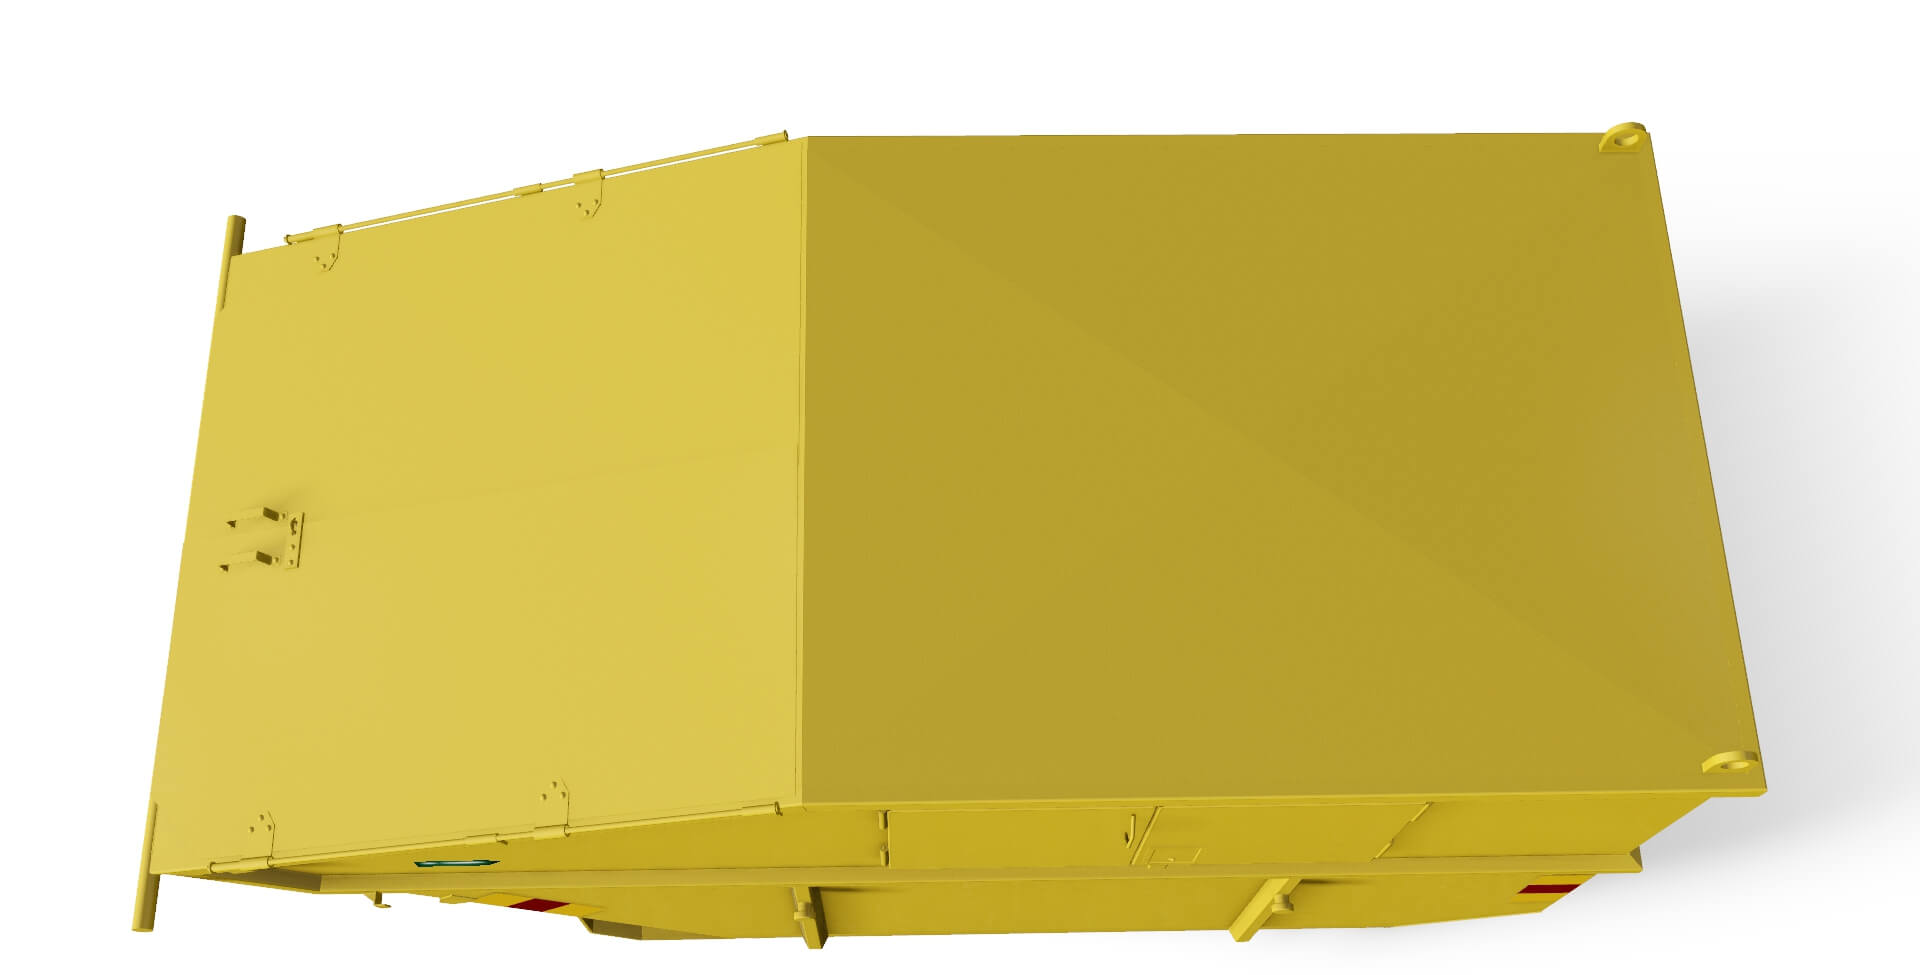 KB-T 9 B ovan